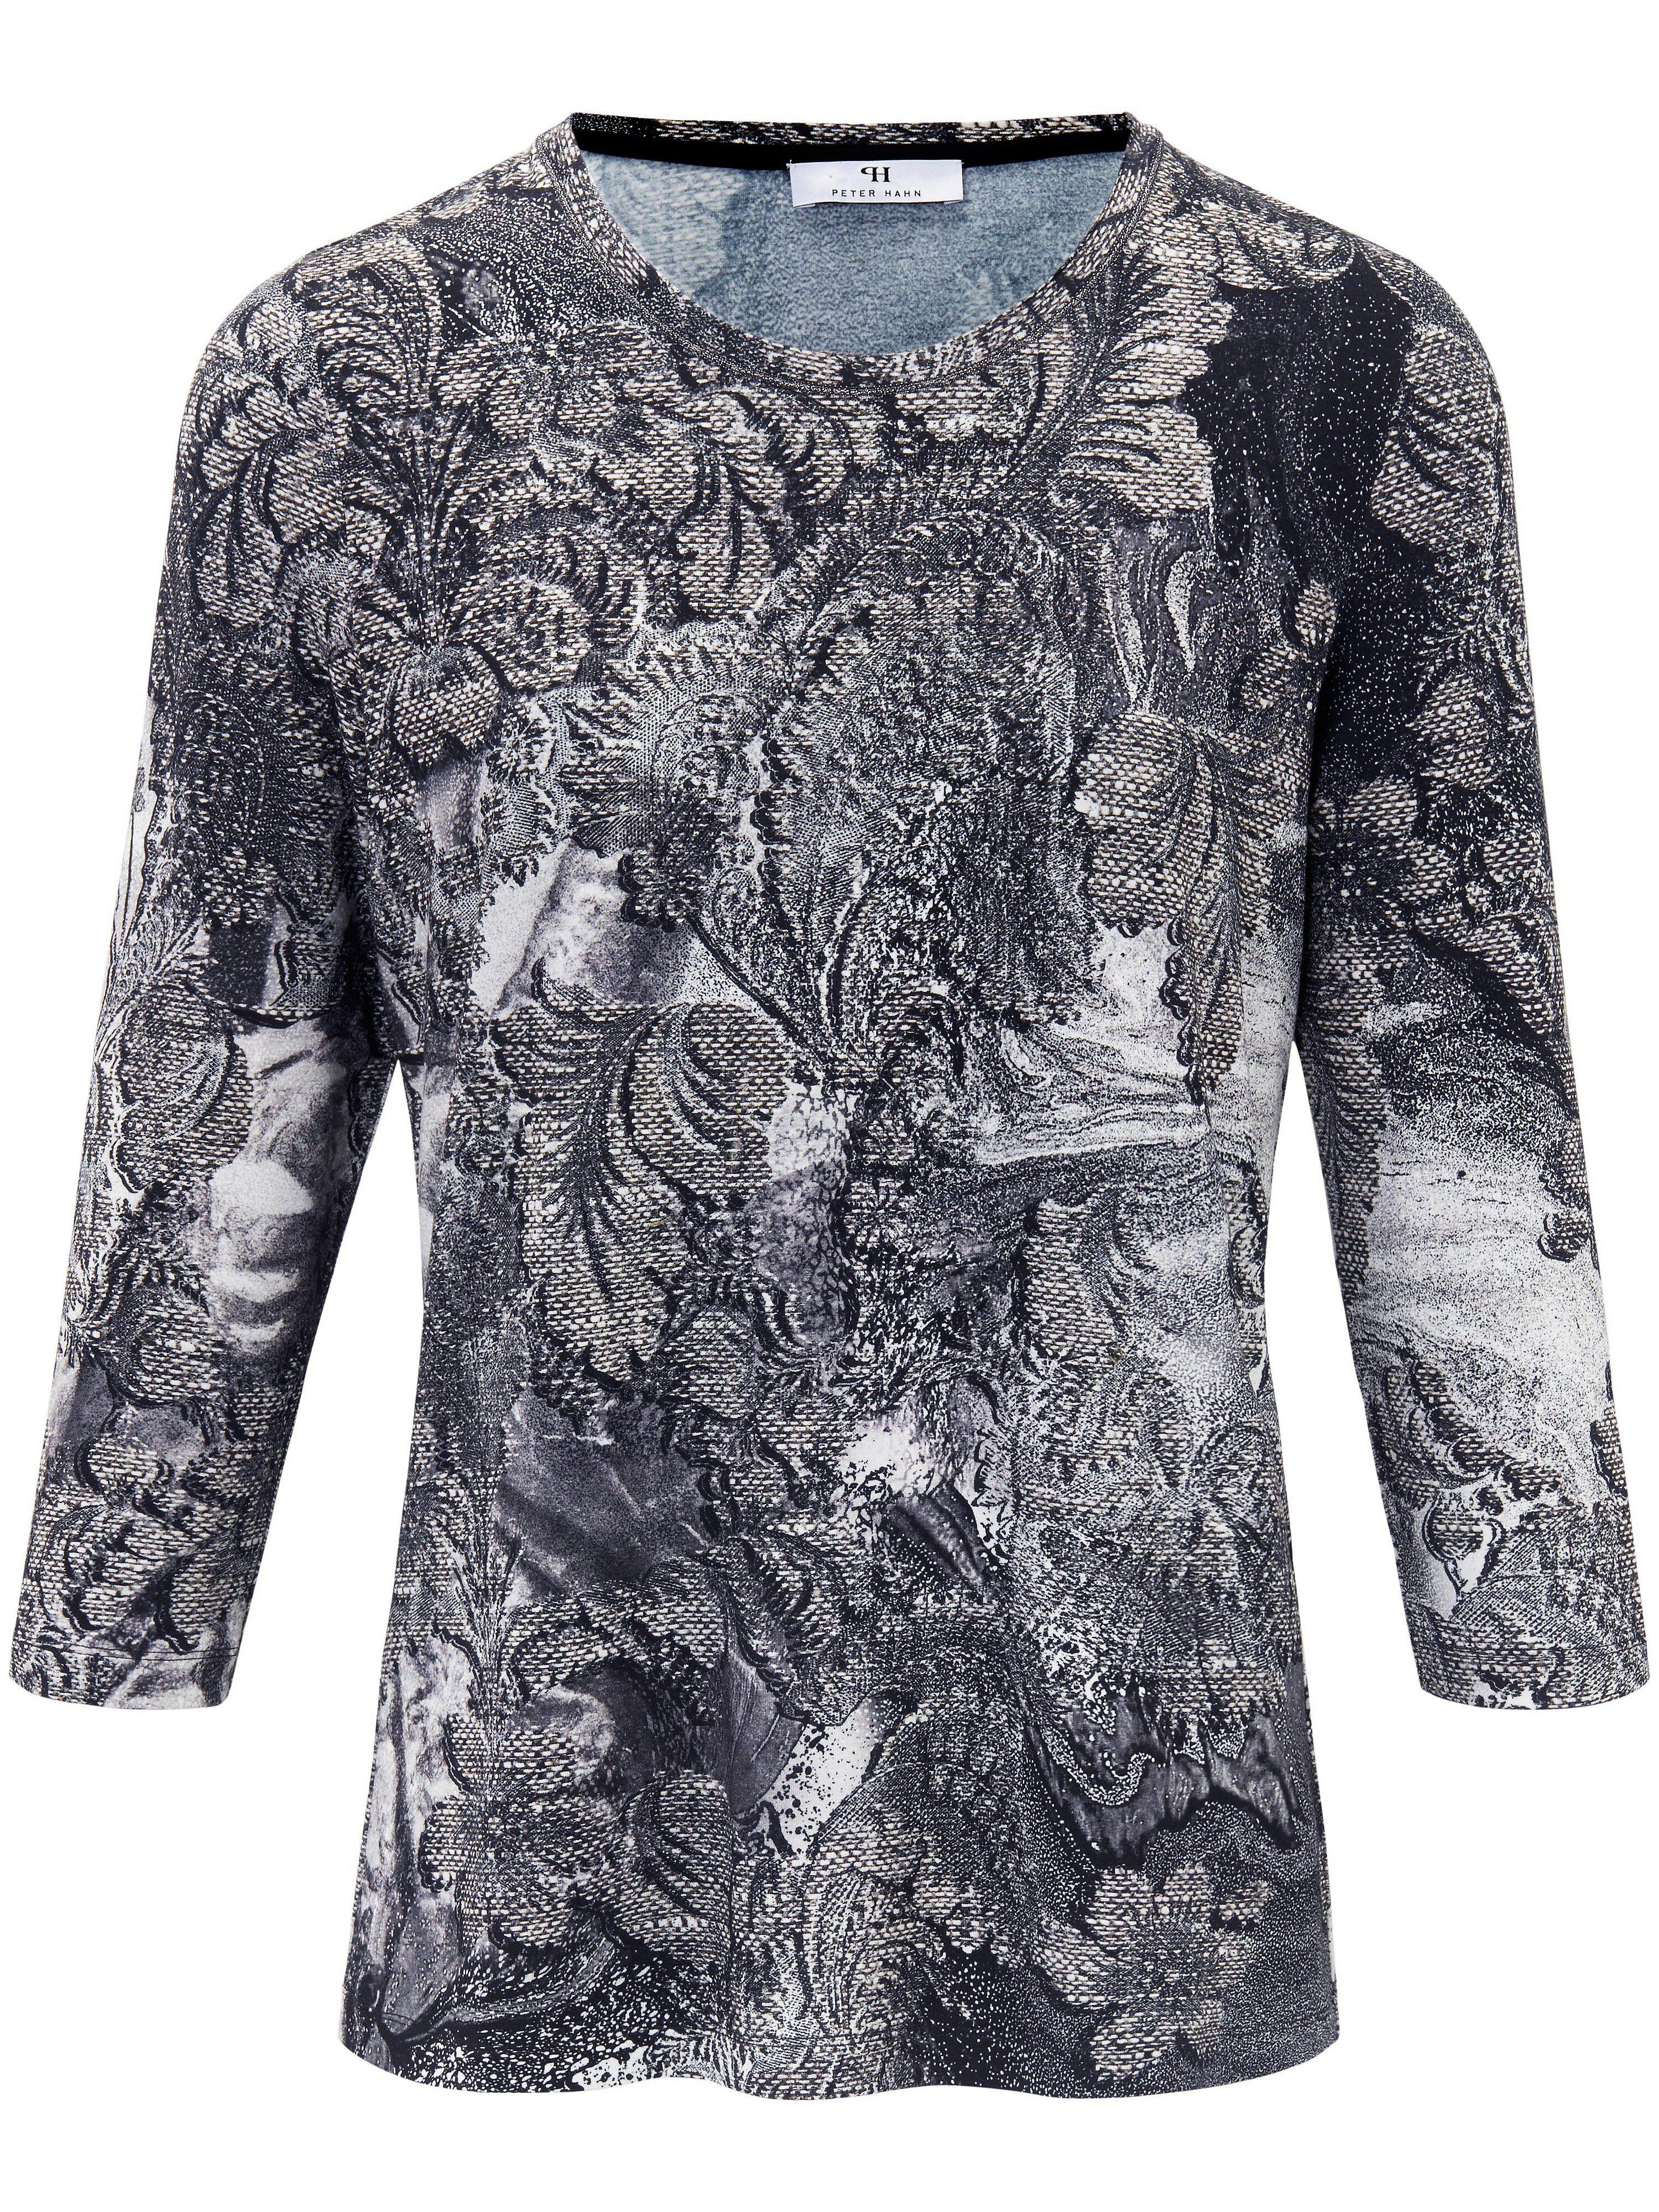 Peter Hahn Le T-shirt manches 3/4  Peter Hahn noir  - Femme - 38